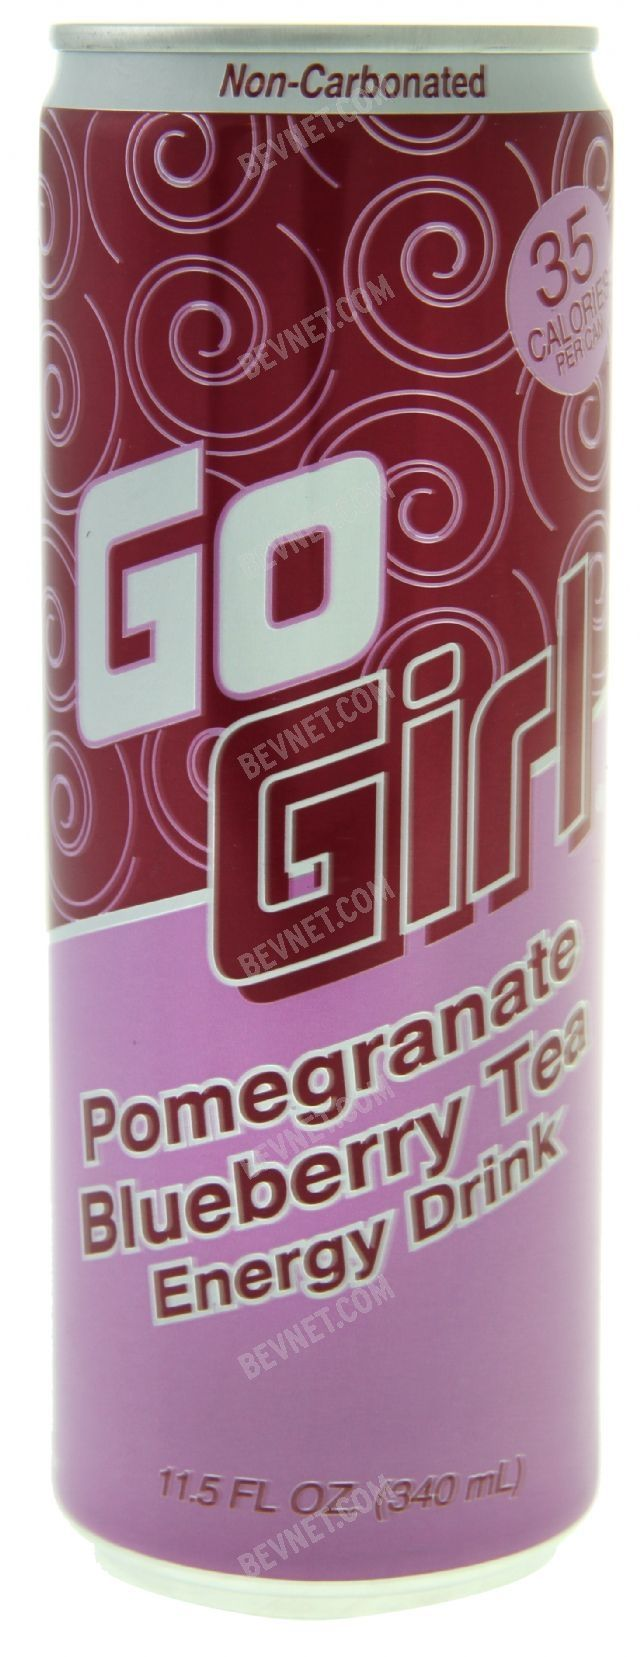 Go Girl Energy Drink: